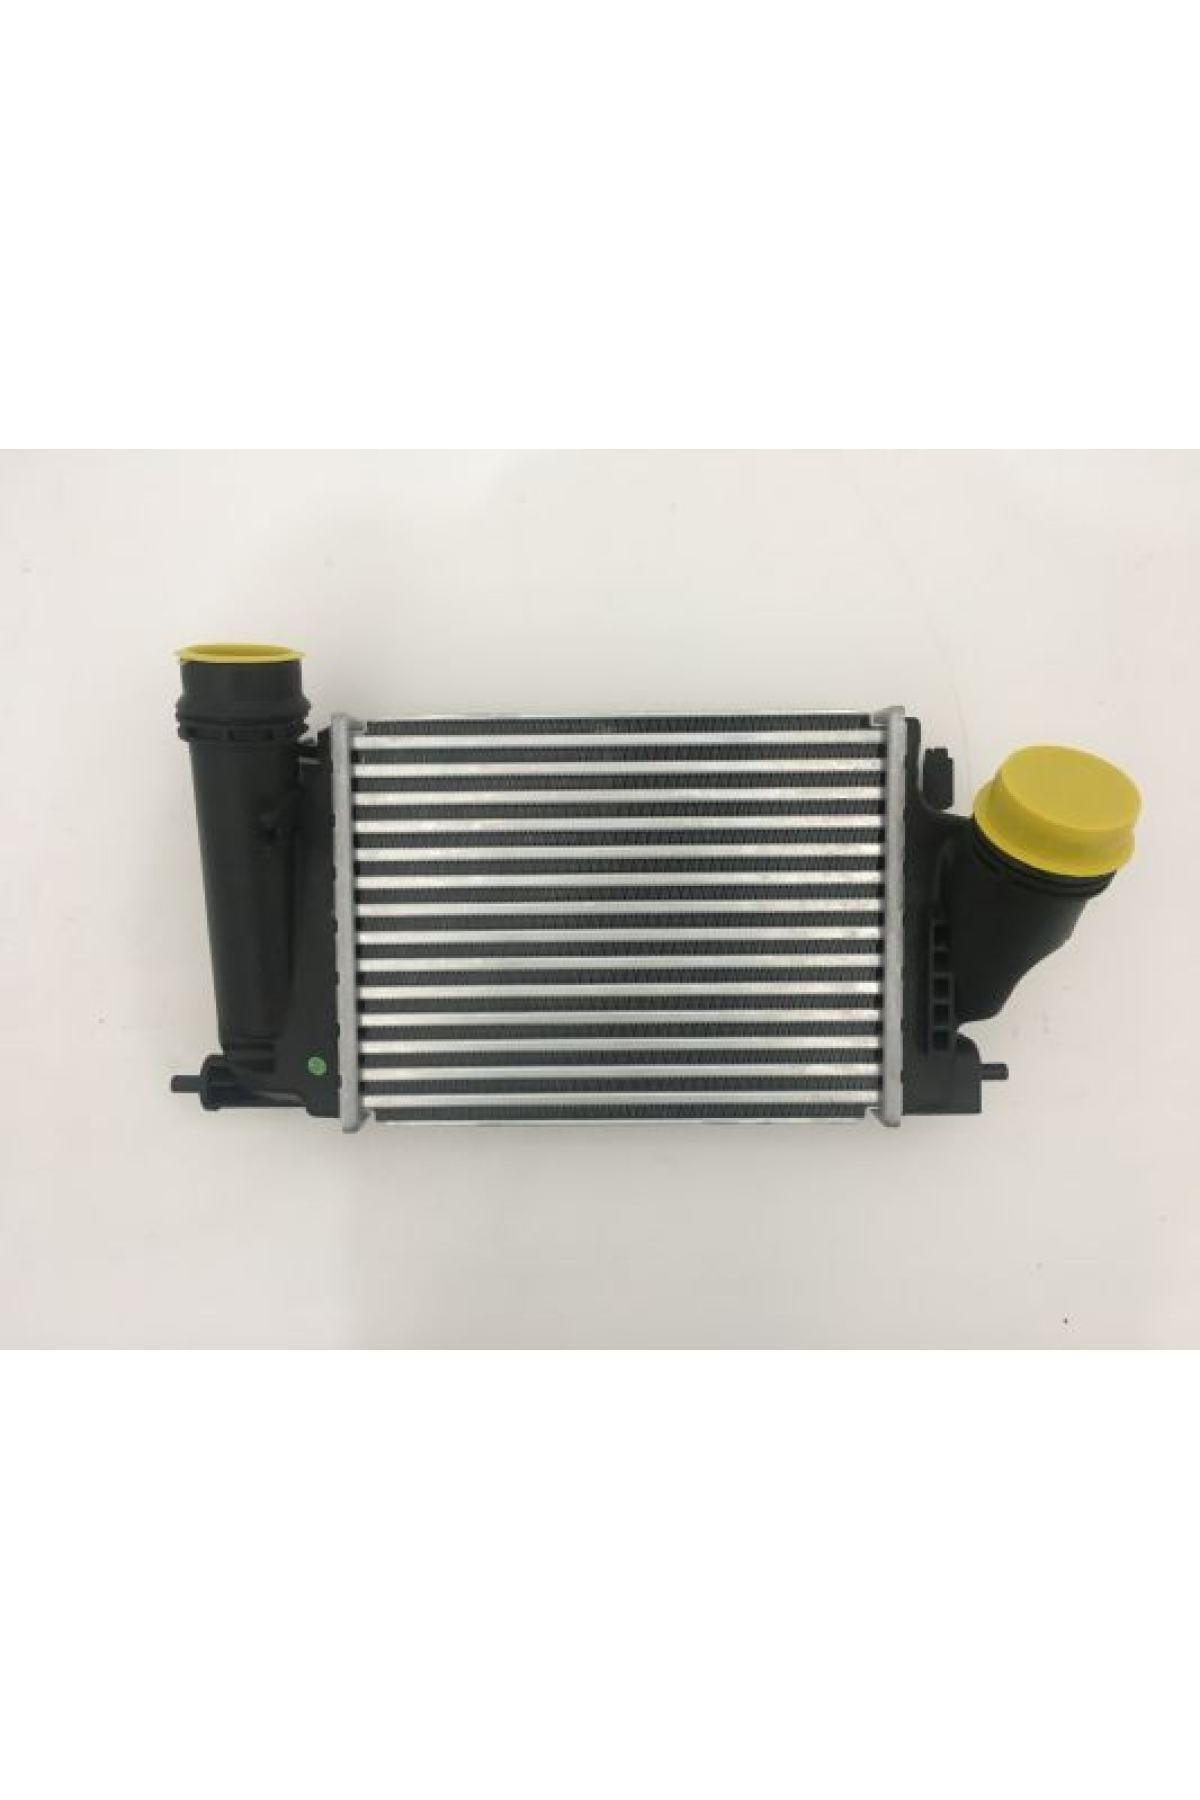 GUST 144614eb0a Turbo Radyatörü Renault Megane Iv 1.6 Dcı 2015> / Nıss 1